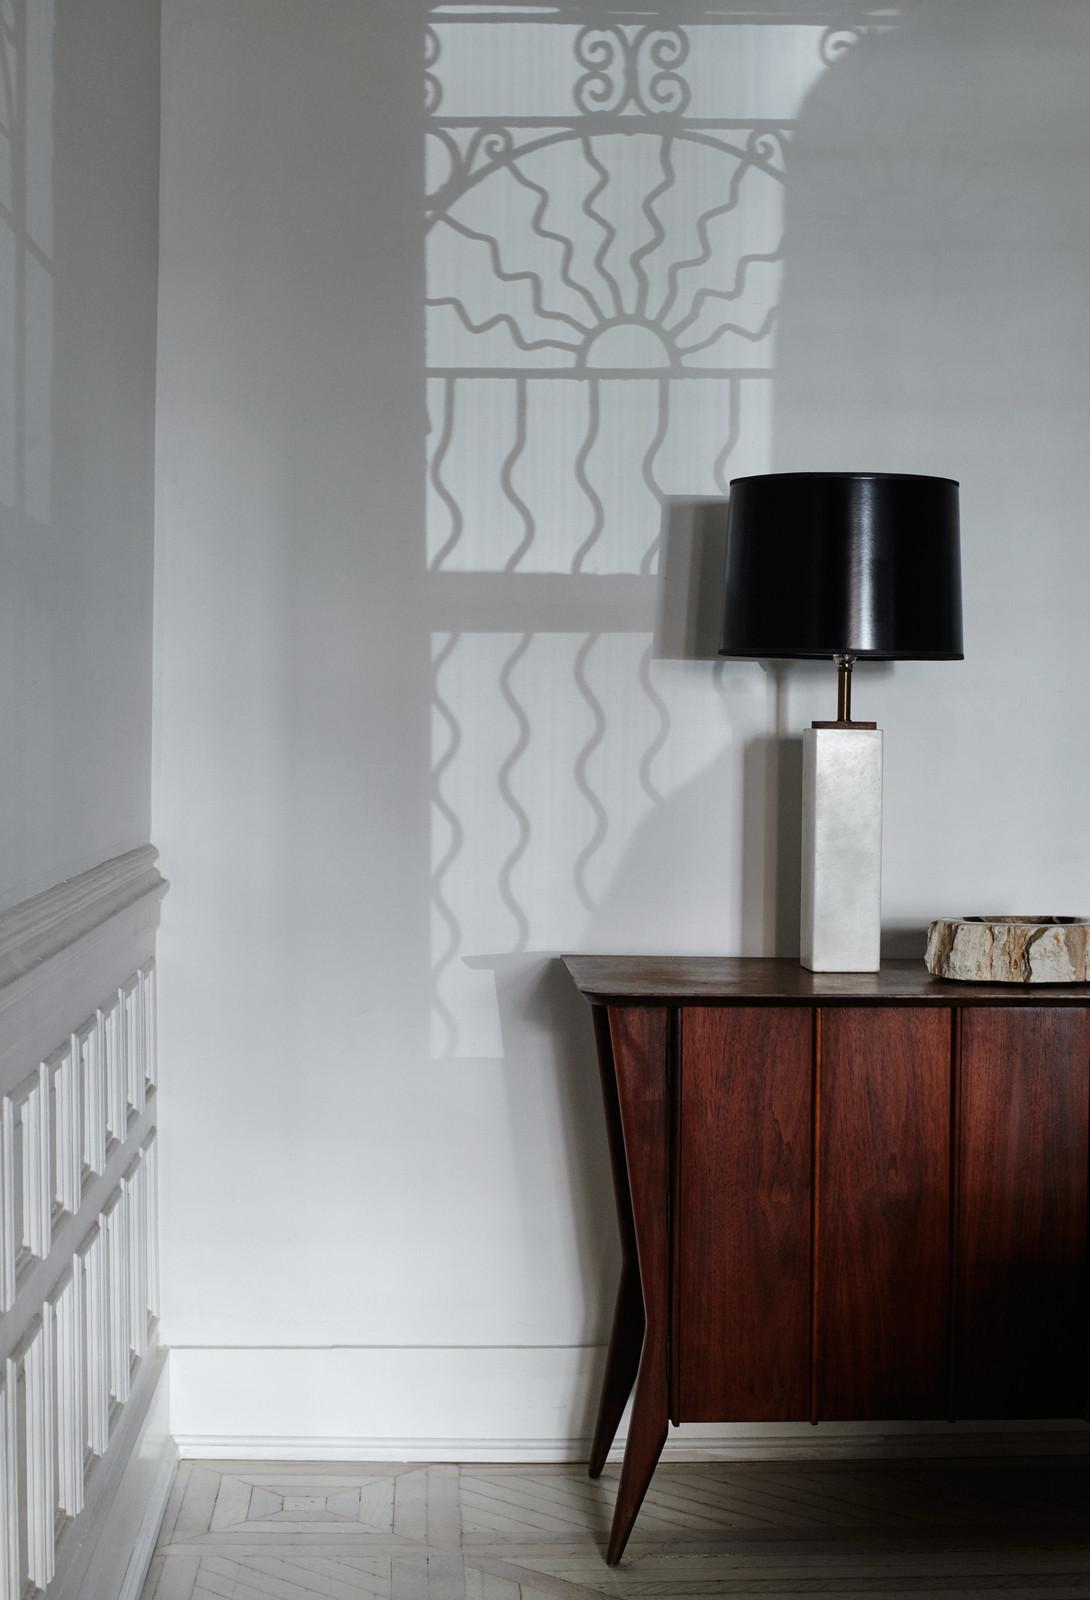 Minimal Brooklyn Retreat Dark Oak Sideboard and Black Lamp